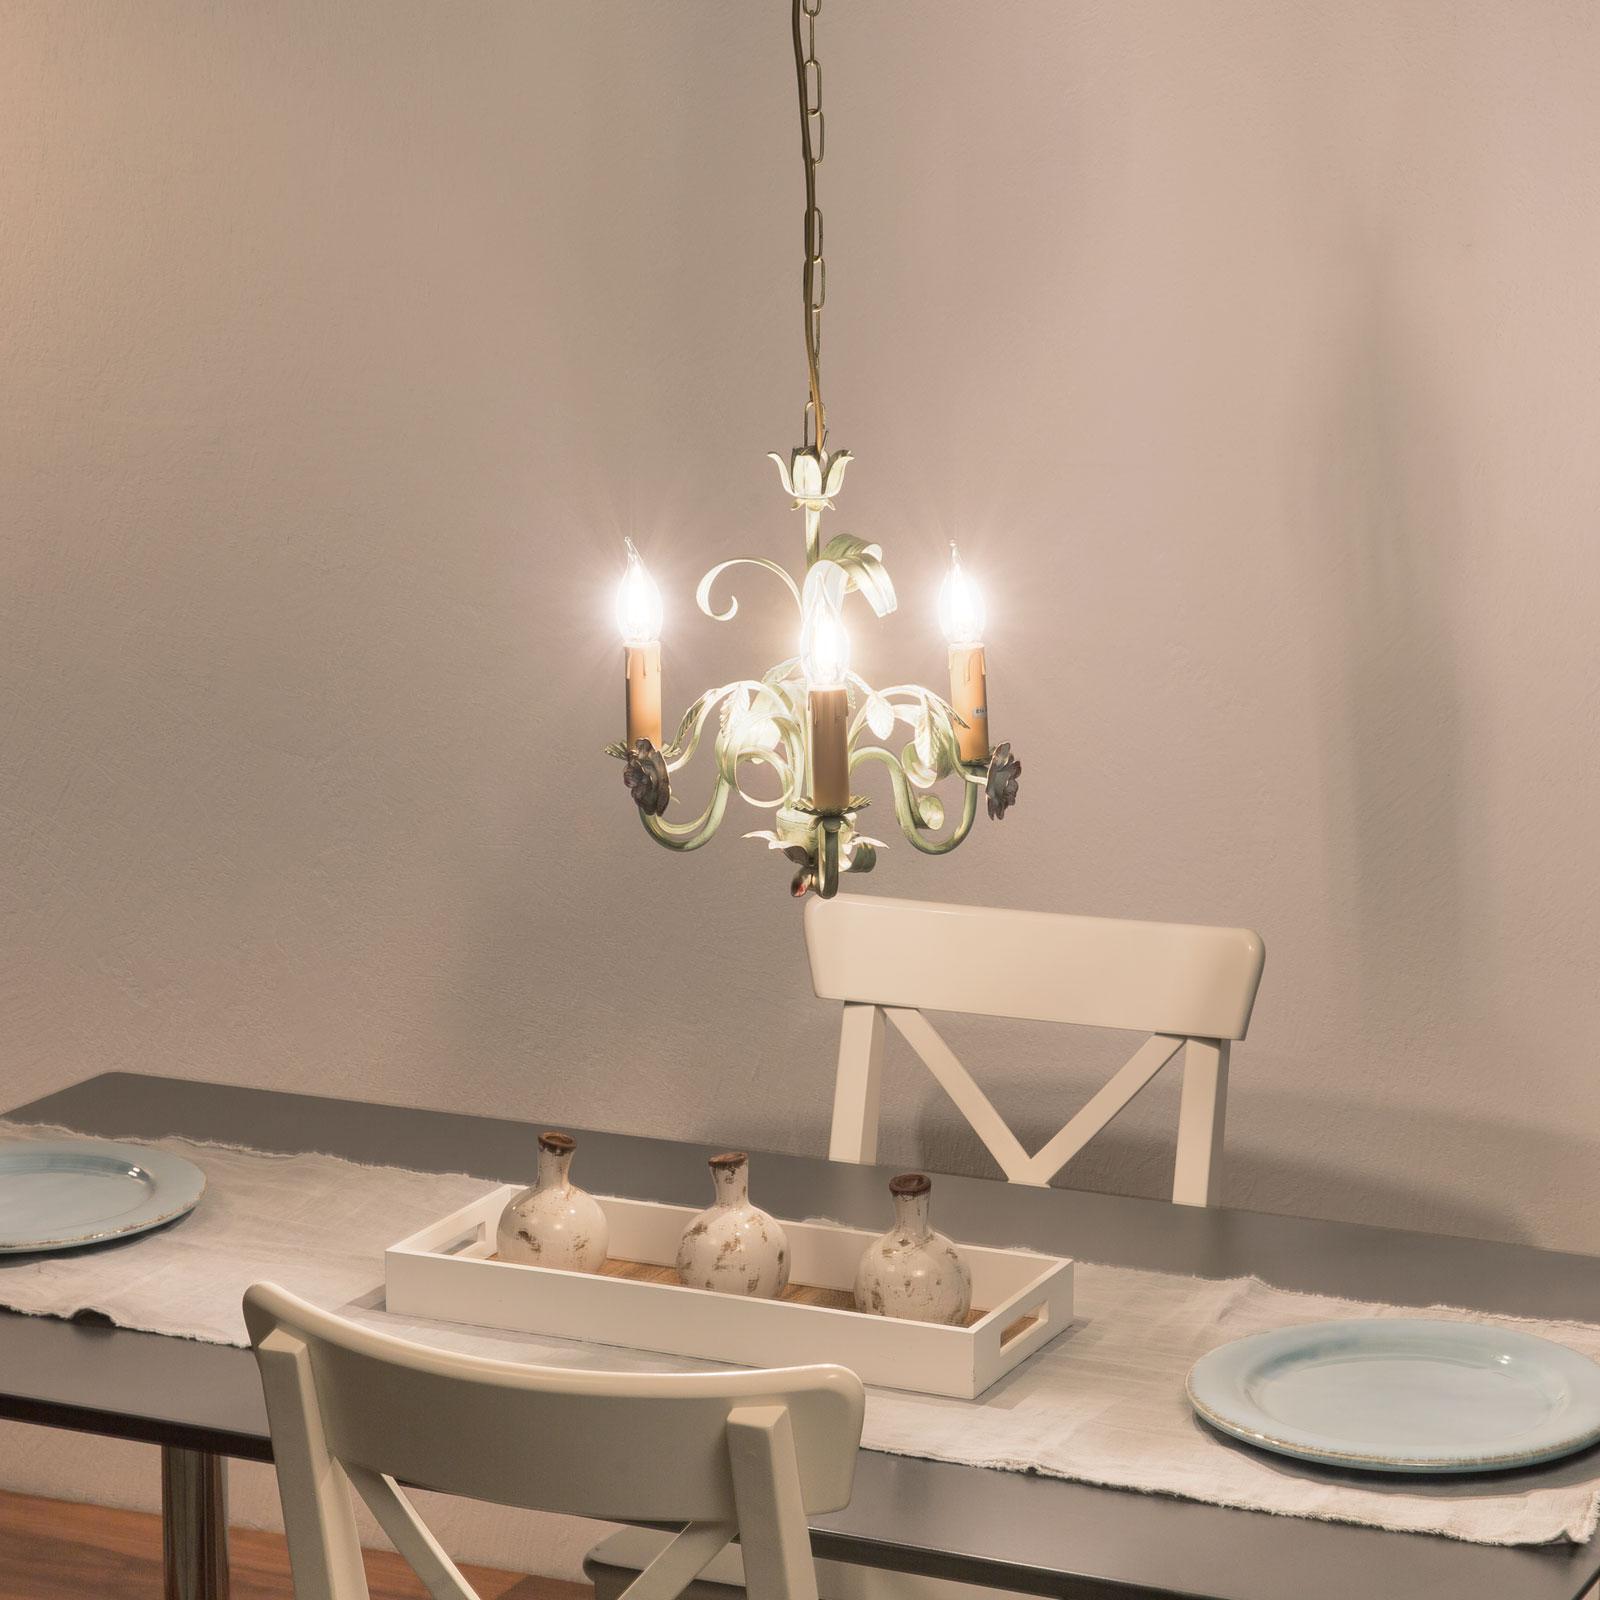 Ljuskrona Tulipe i florentinsk stil, 3 lampor